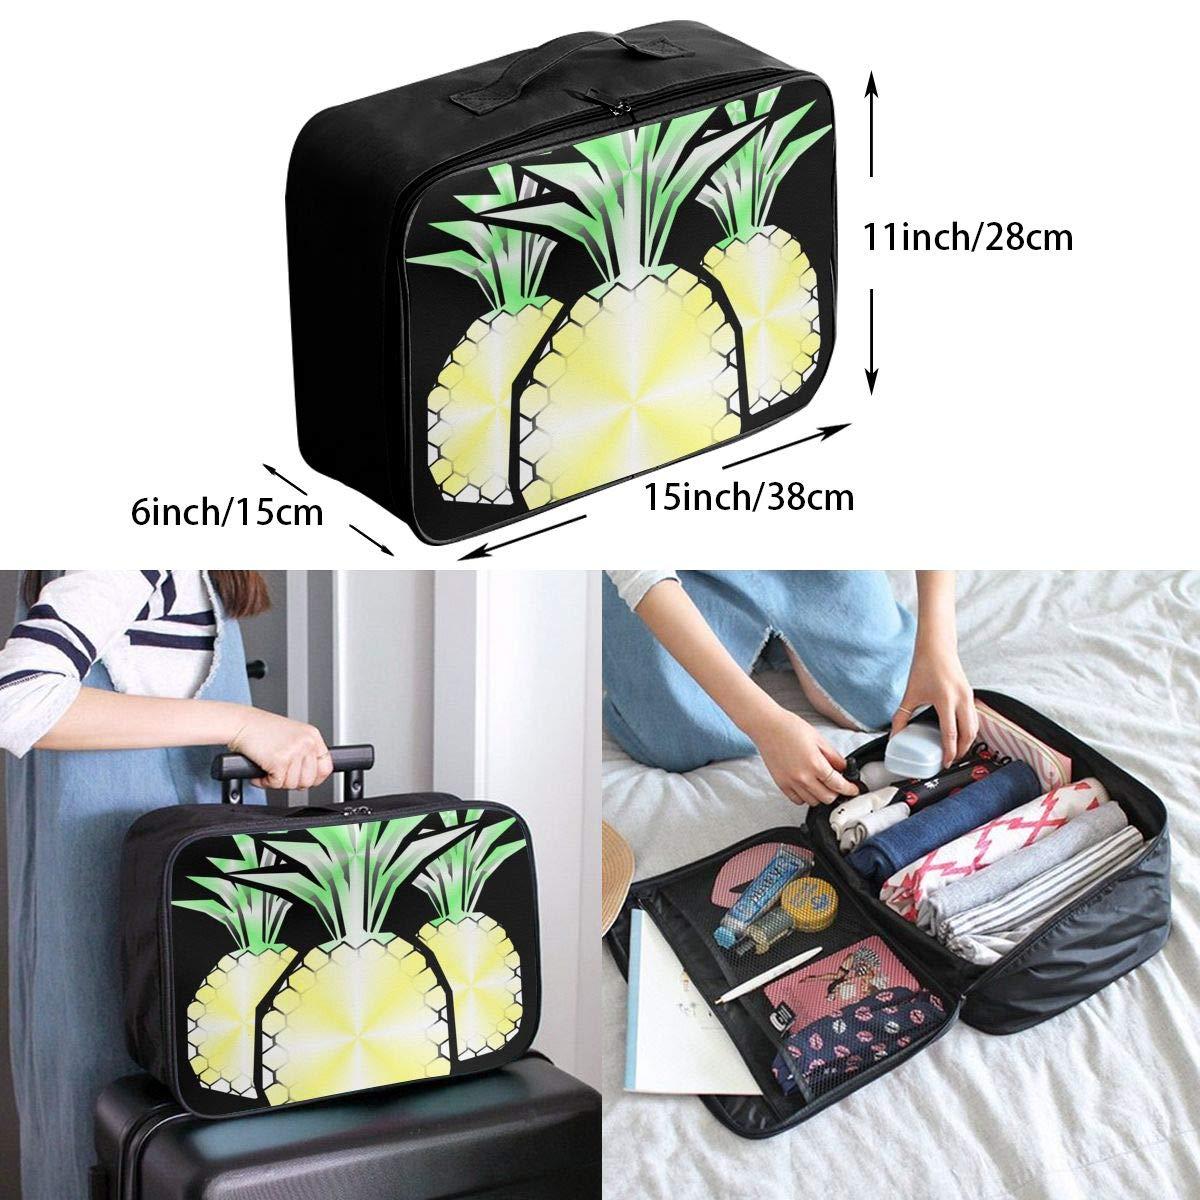 ADGAI Oil Painting Pineapple Canvas Travel Weekender Bag,Fashion Custom Lightweight Large Capacity Portable Luggage Bag,Suitcase Trolley Bag